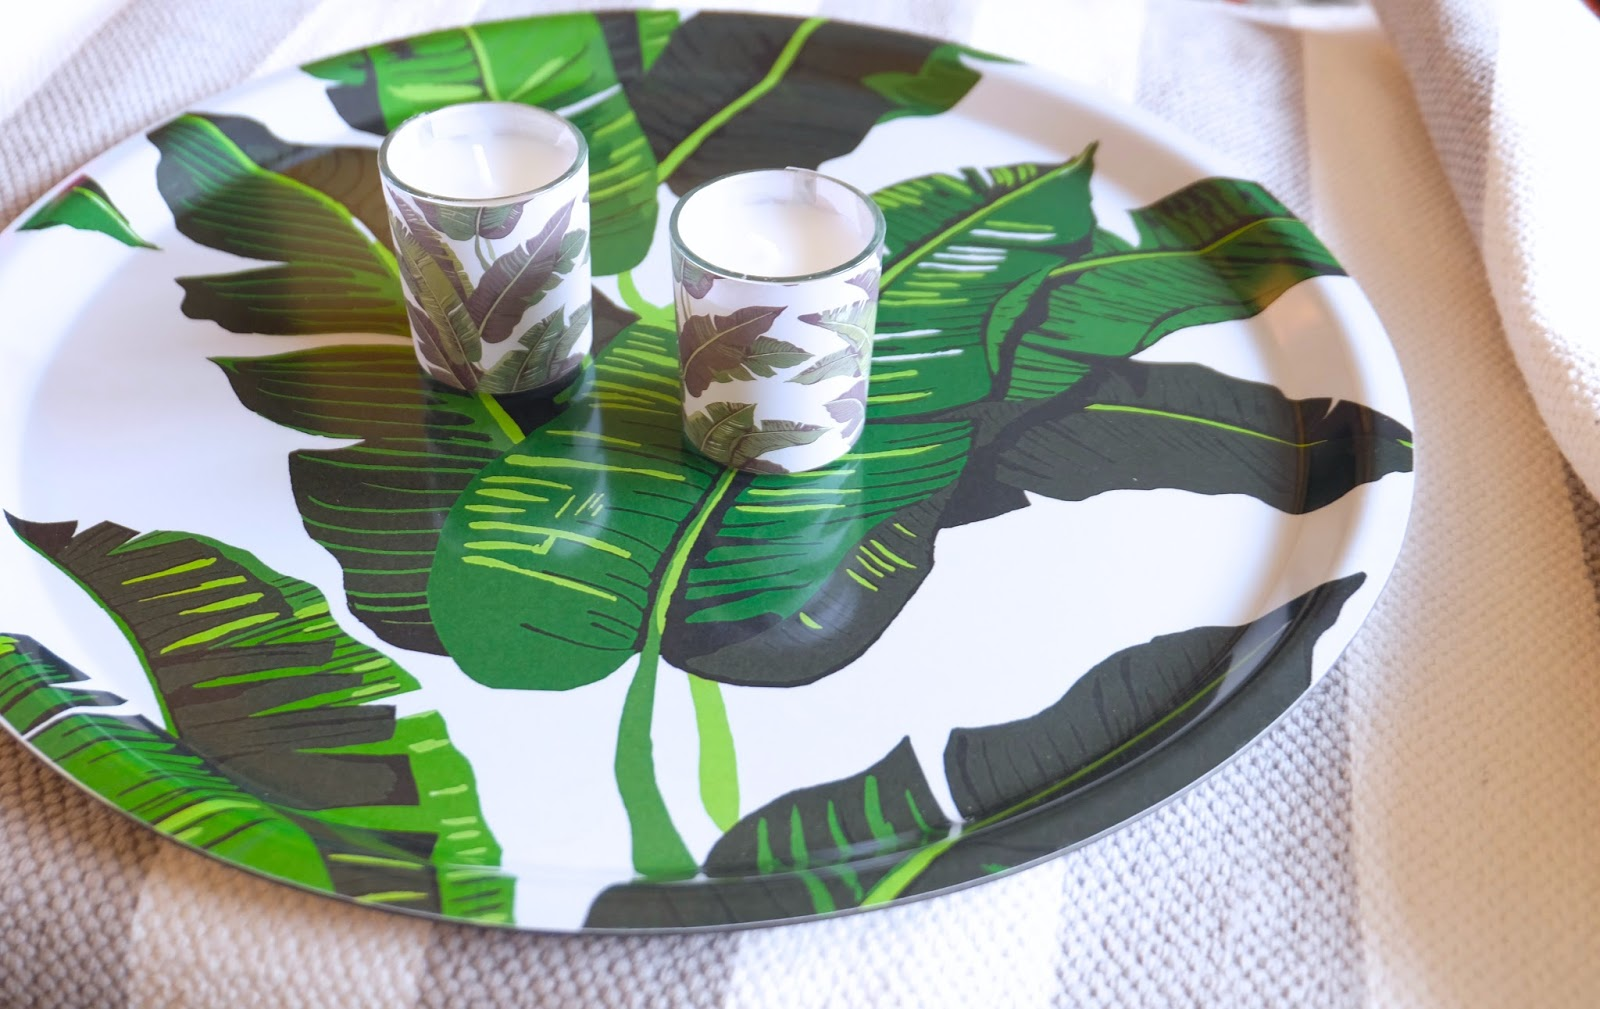 Banana Leaf Tray U0026 Banana Leaf Candles By Hu0026M Home   Tropical Kitchen    Transform Your